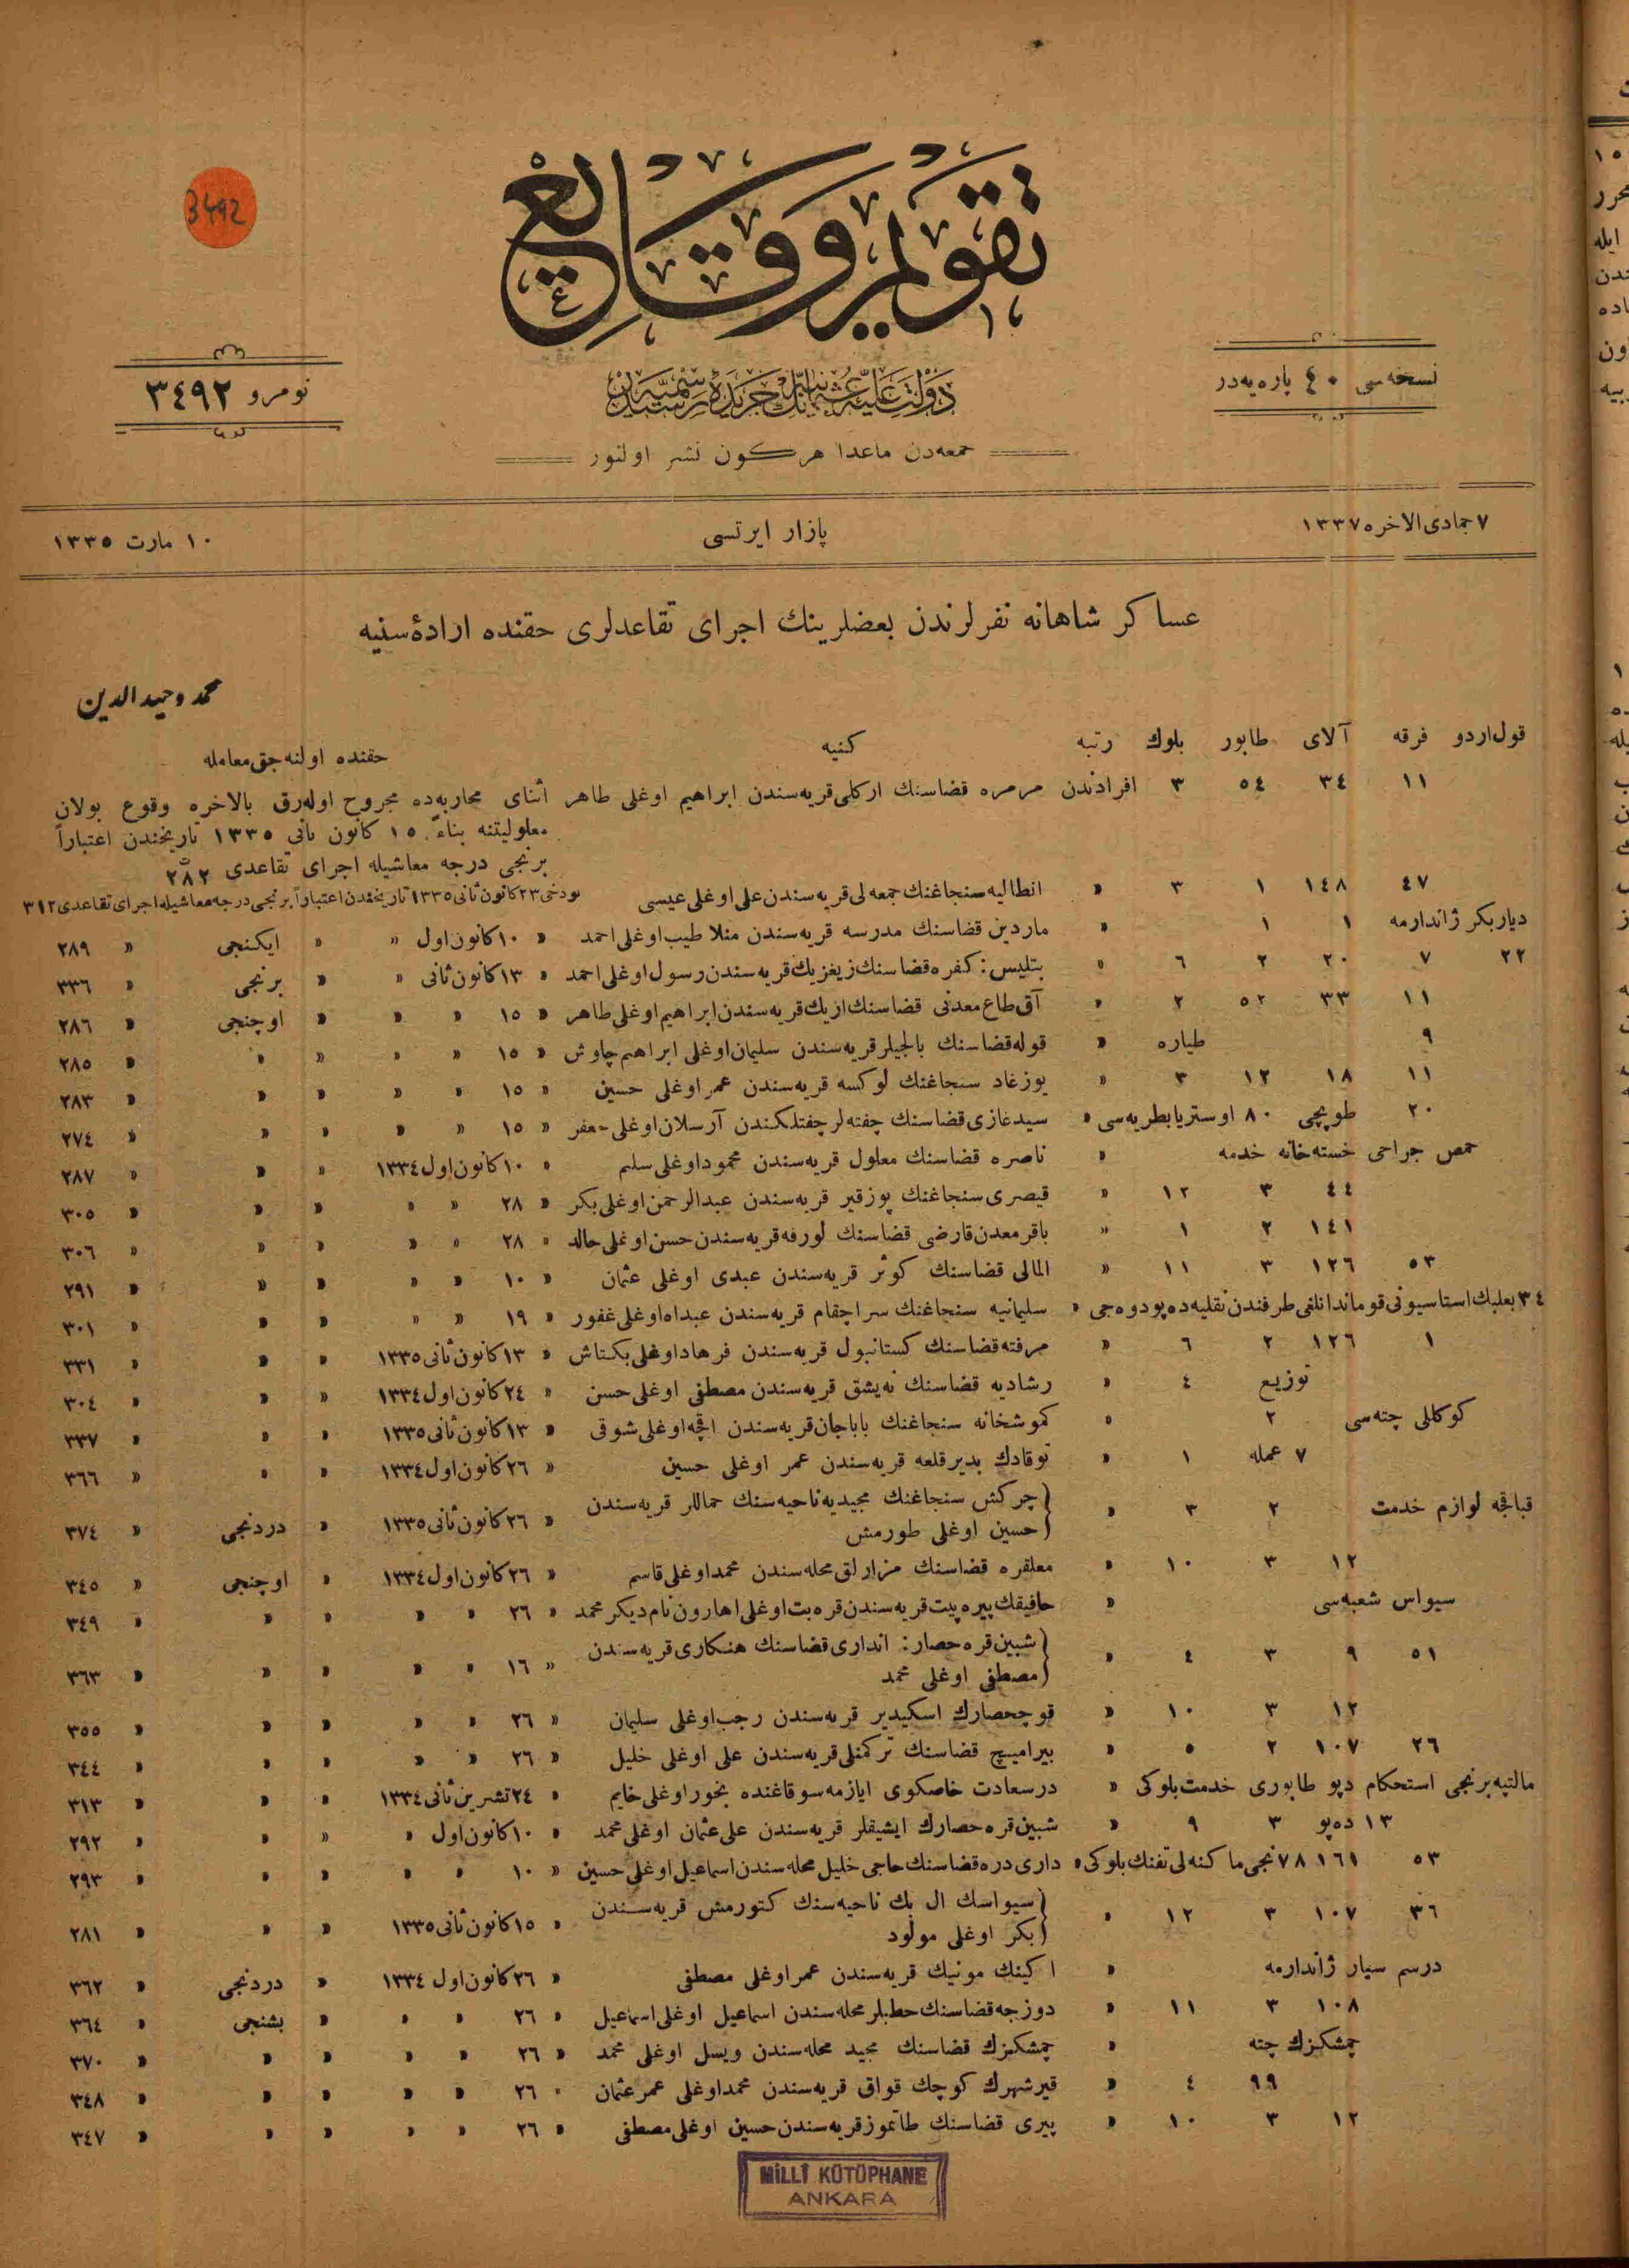 10 Mart 1919 Tarihli Takvim-i Vekayi Gazetesi Sayfa 1